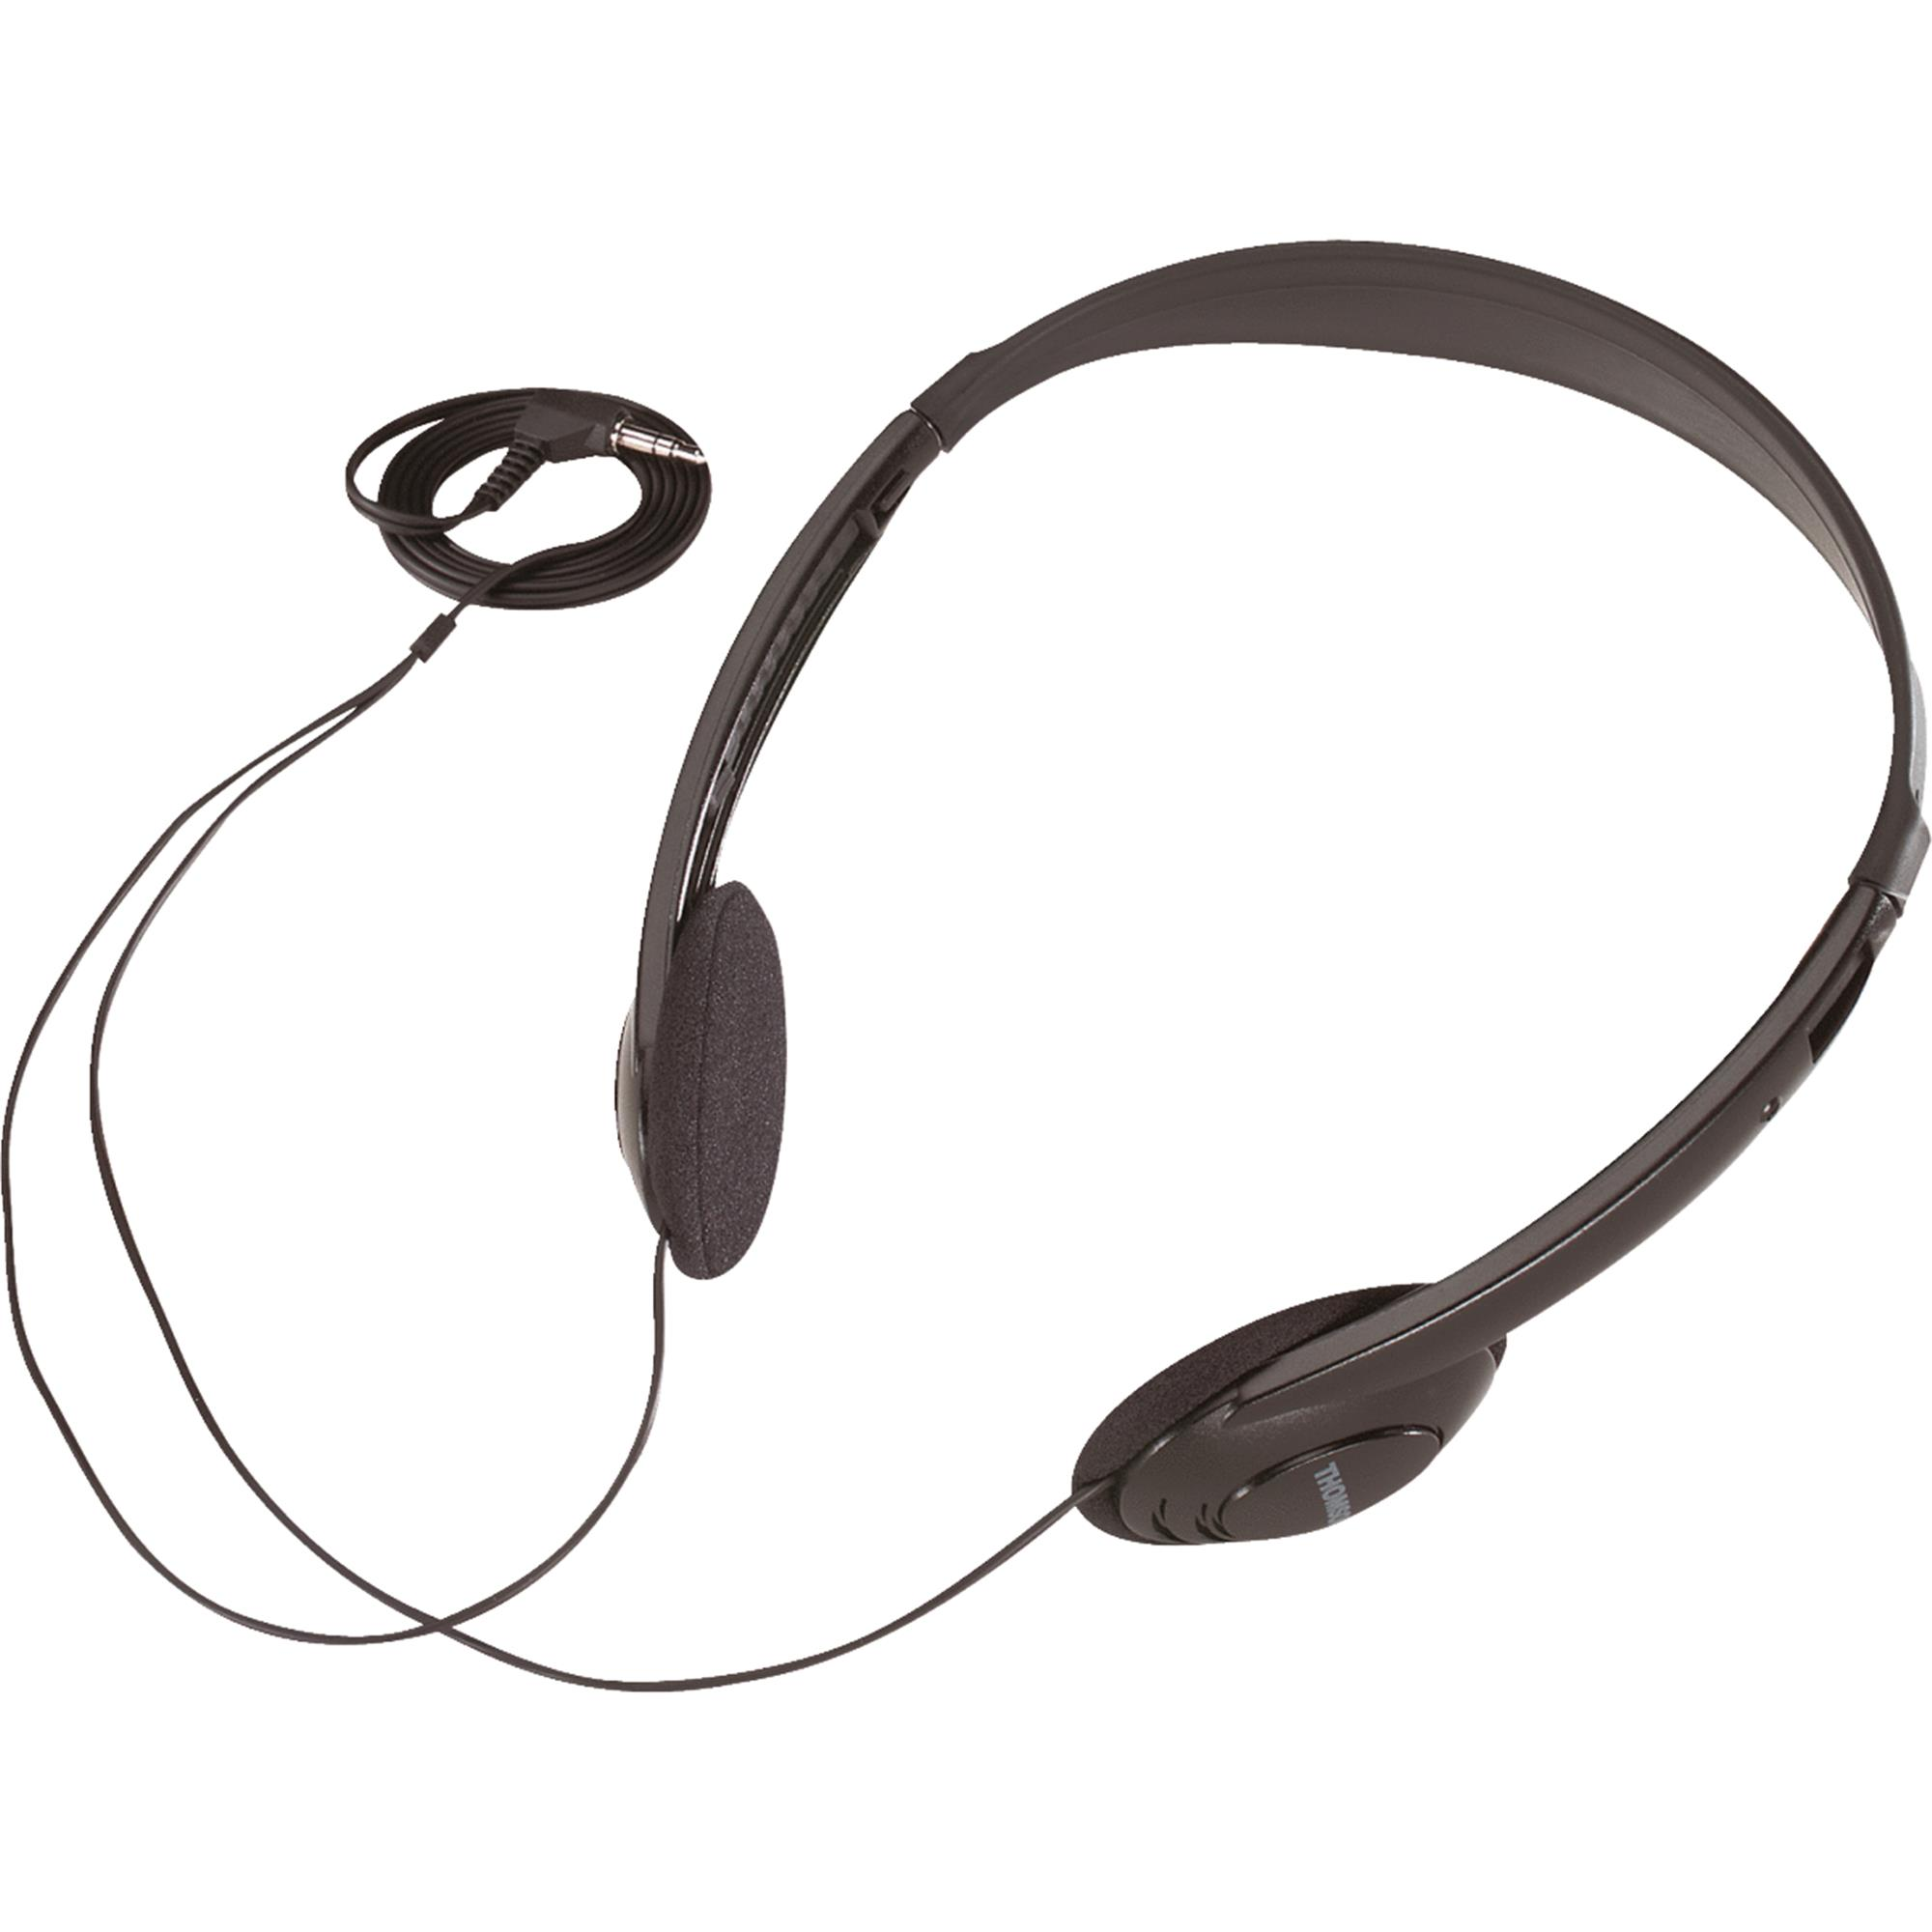 Headband Stereo Headphones